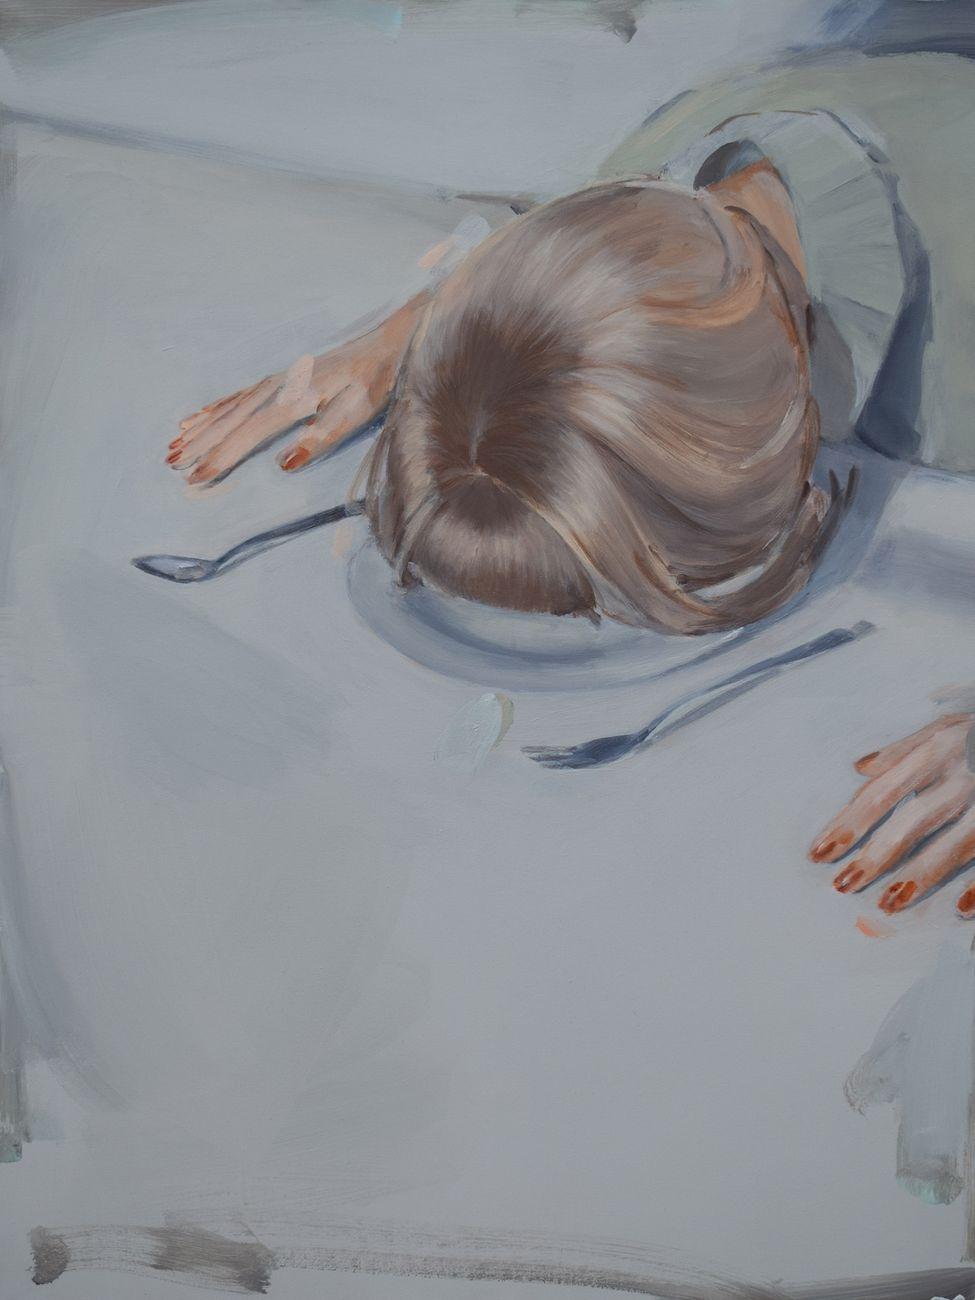 romina-bassu-paintings-everythingwithatwist-07